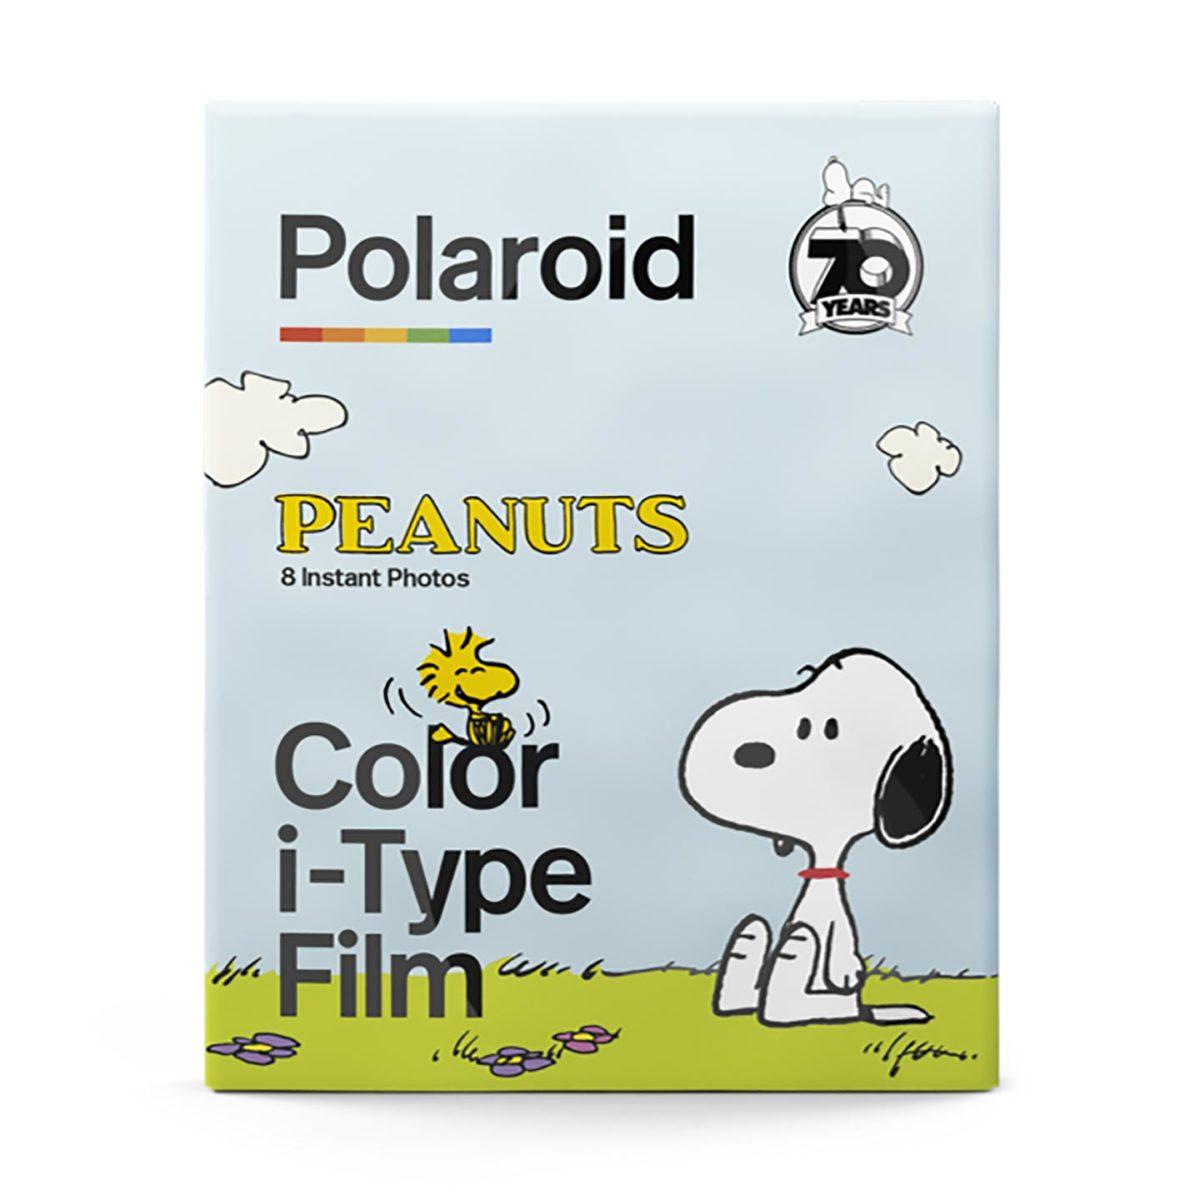 polaroid_i_type_color_film_peanuts_02